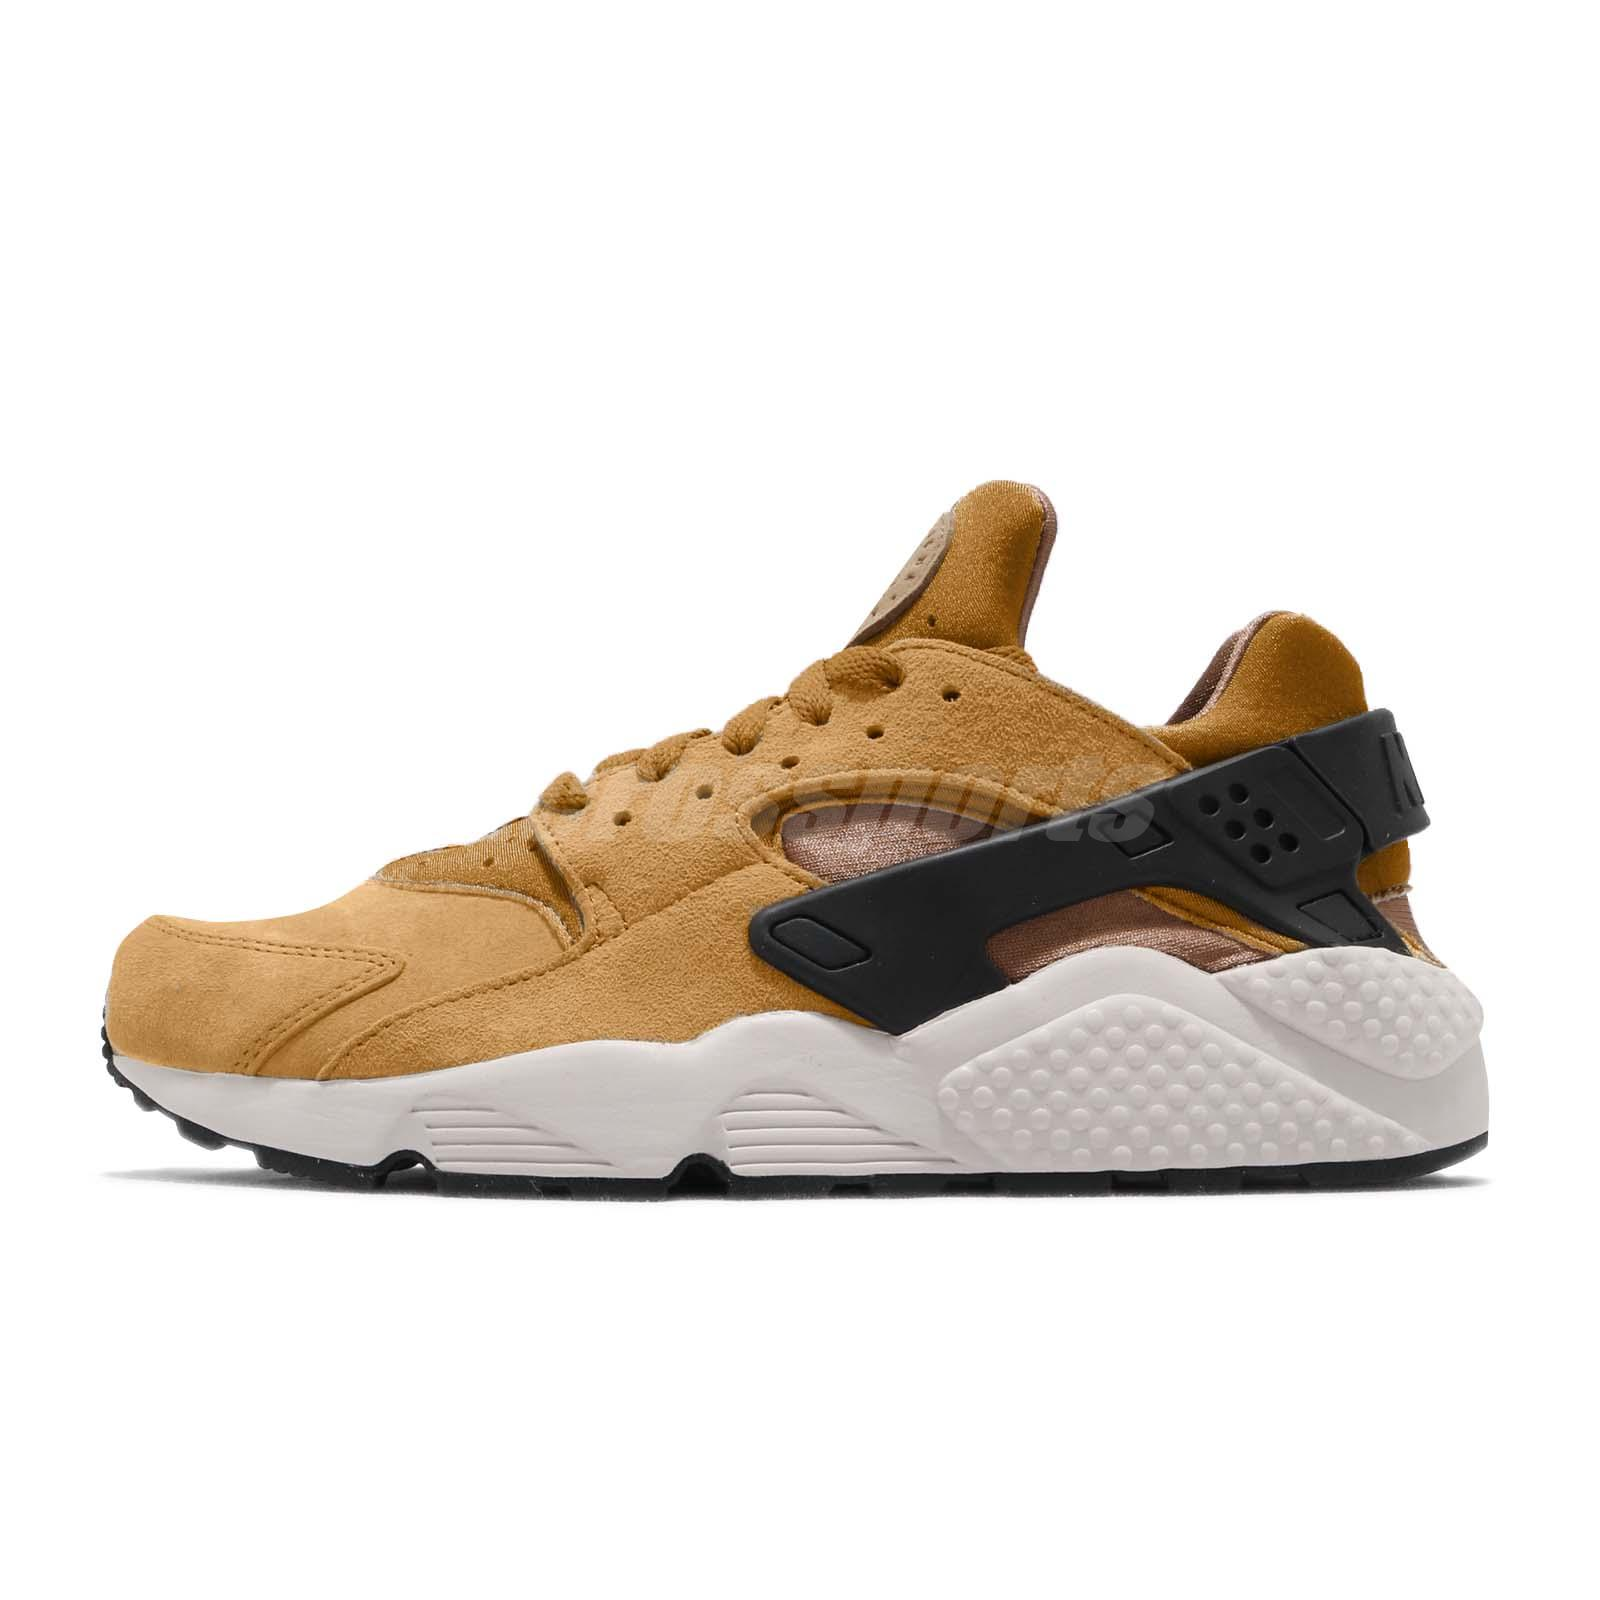 6368cfb91857 Nike Air Huarache Run PRM Wheat Pack Black Light Bone Men Shoes 704830-700